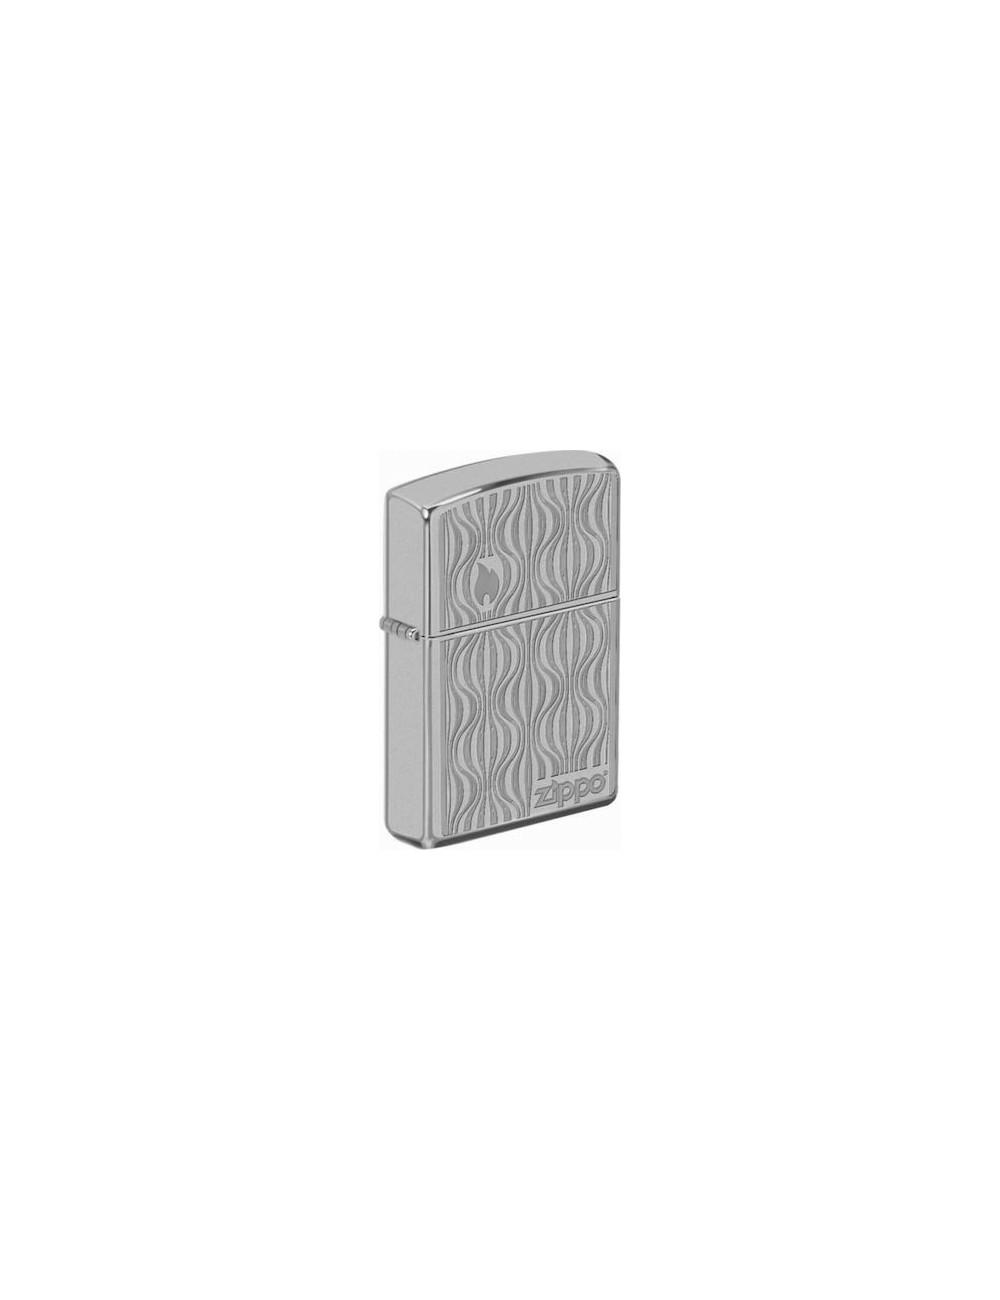 Zippo 49423 Zippo Geometric Design